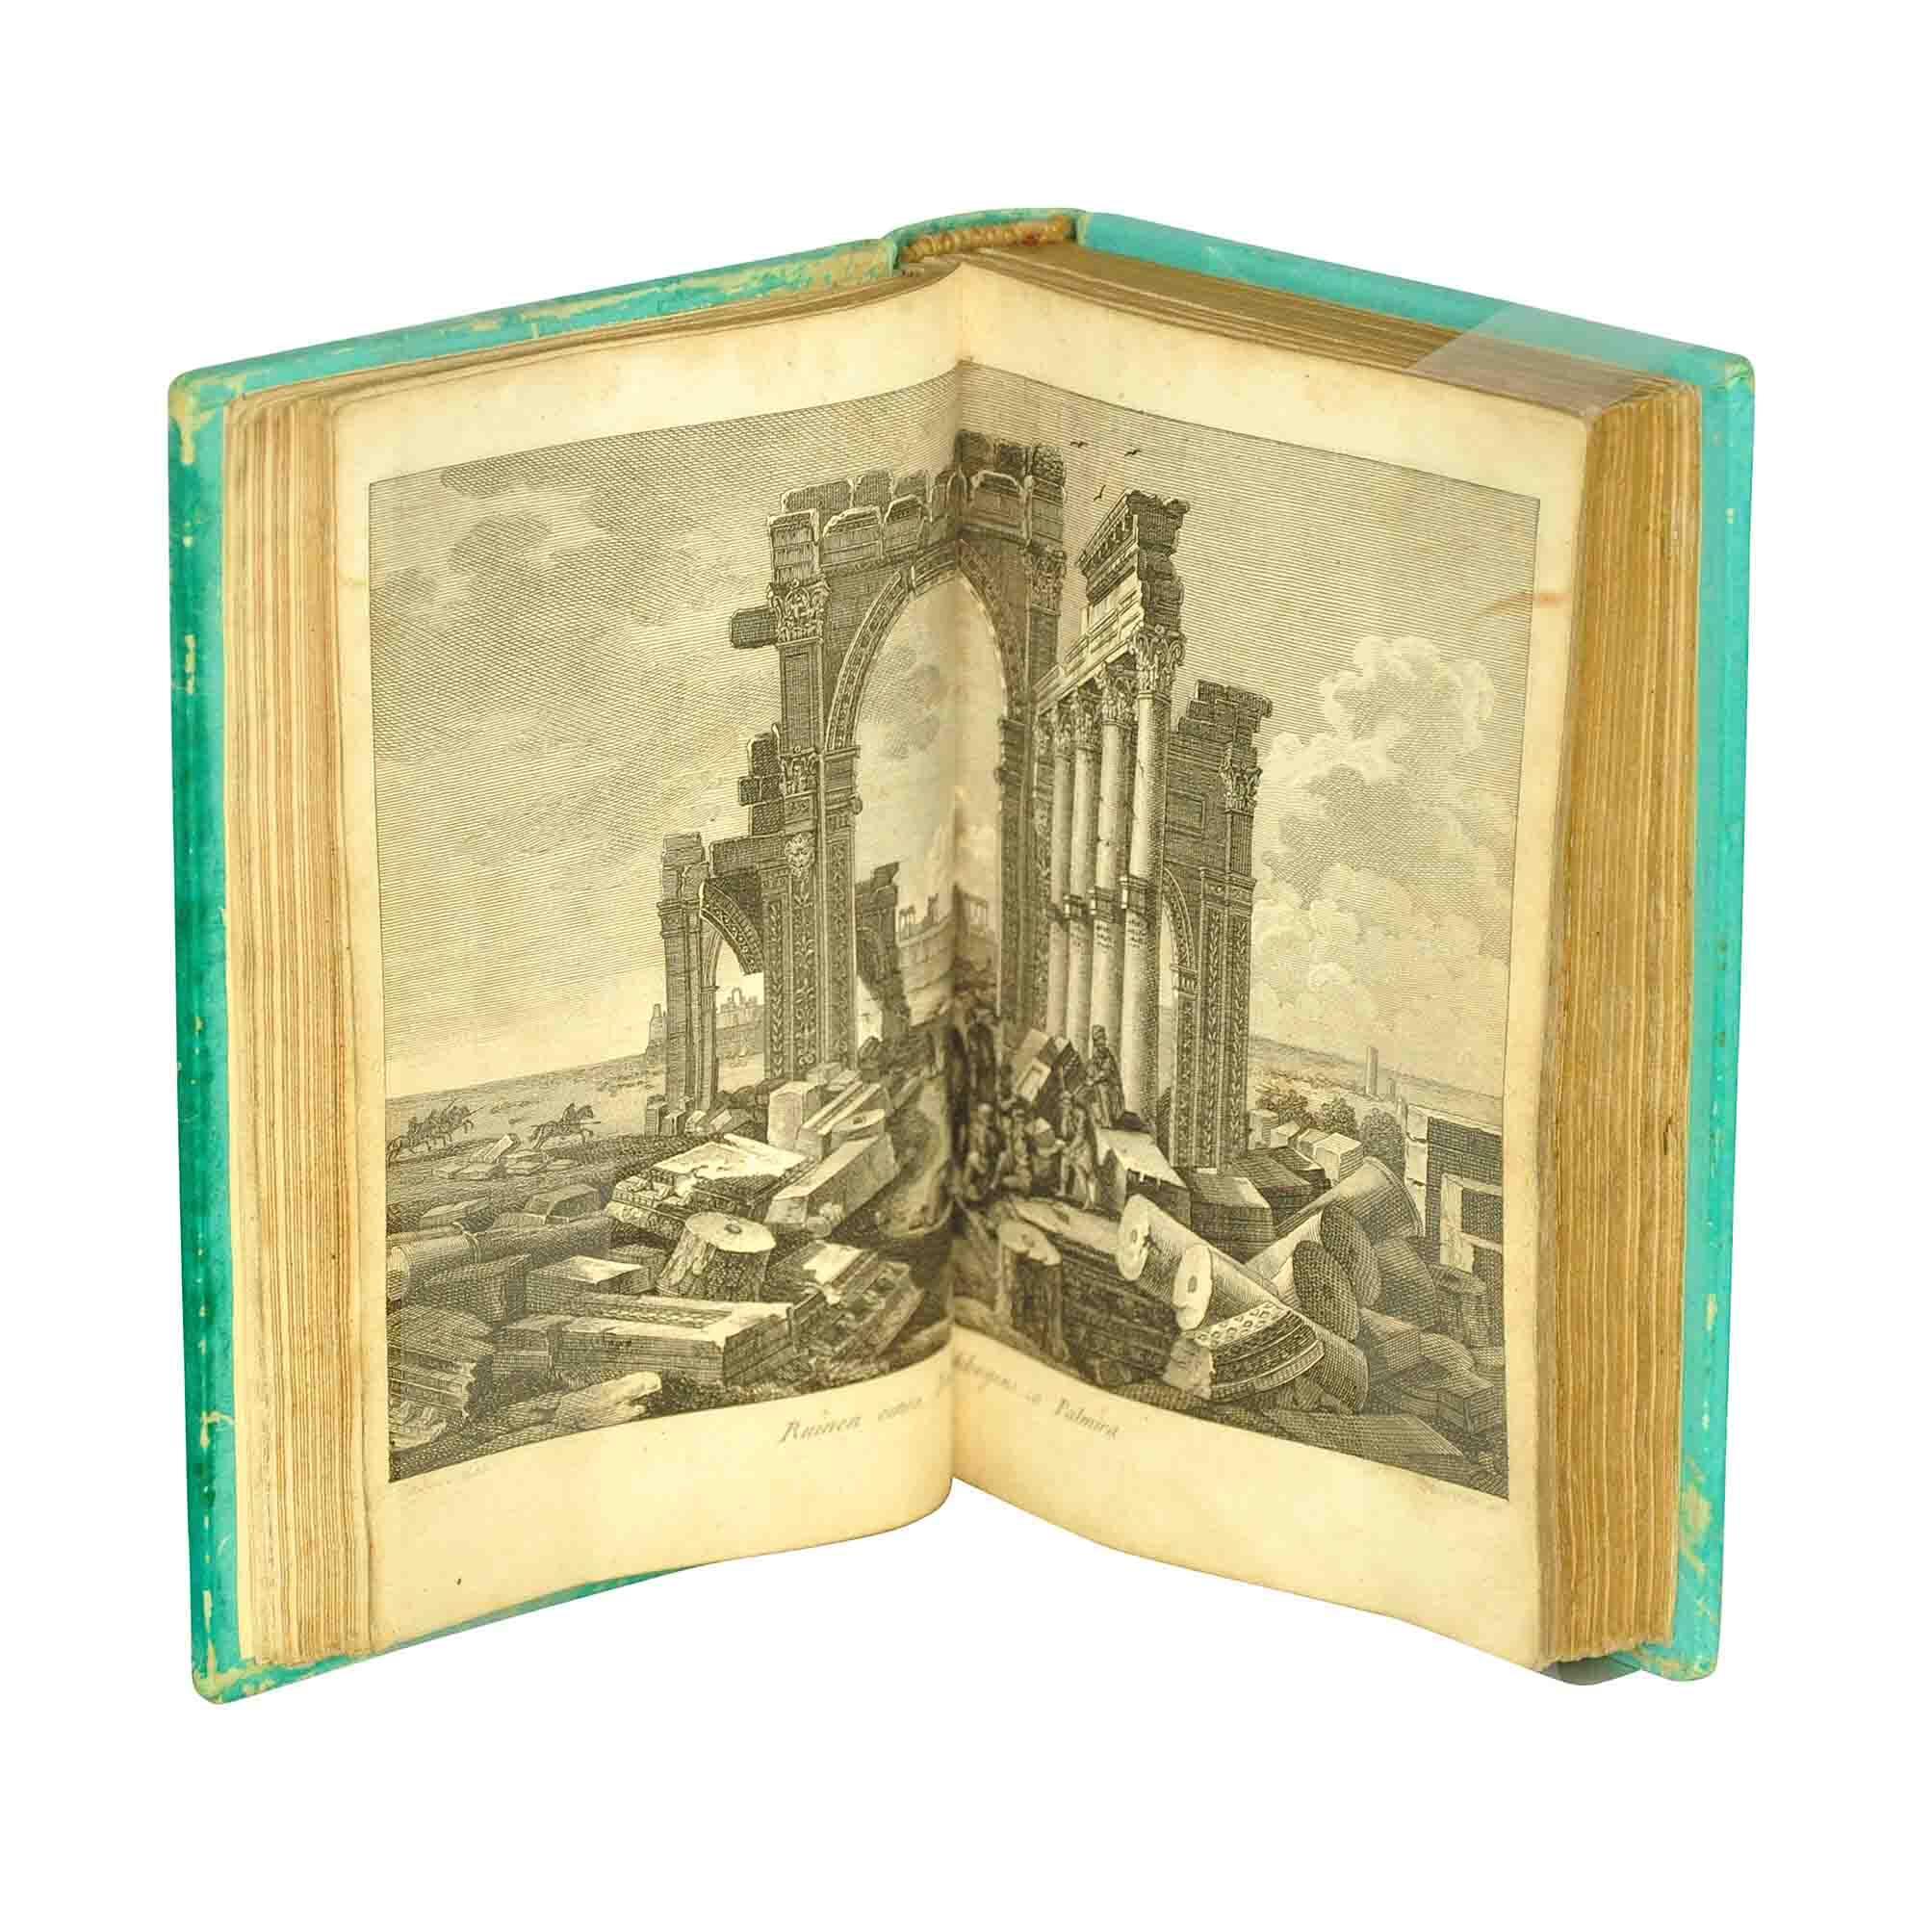 5472 Wiener Taschenbuch 1804 Palmyra Plate Palmyra A N